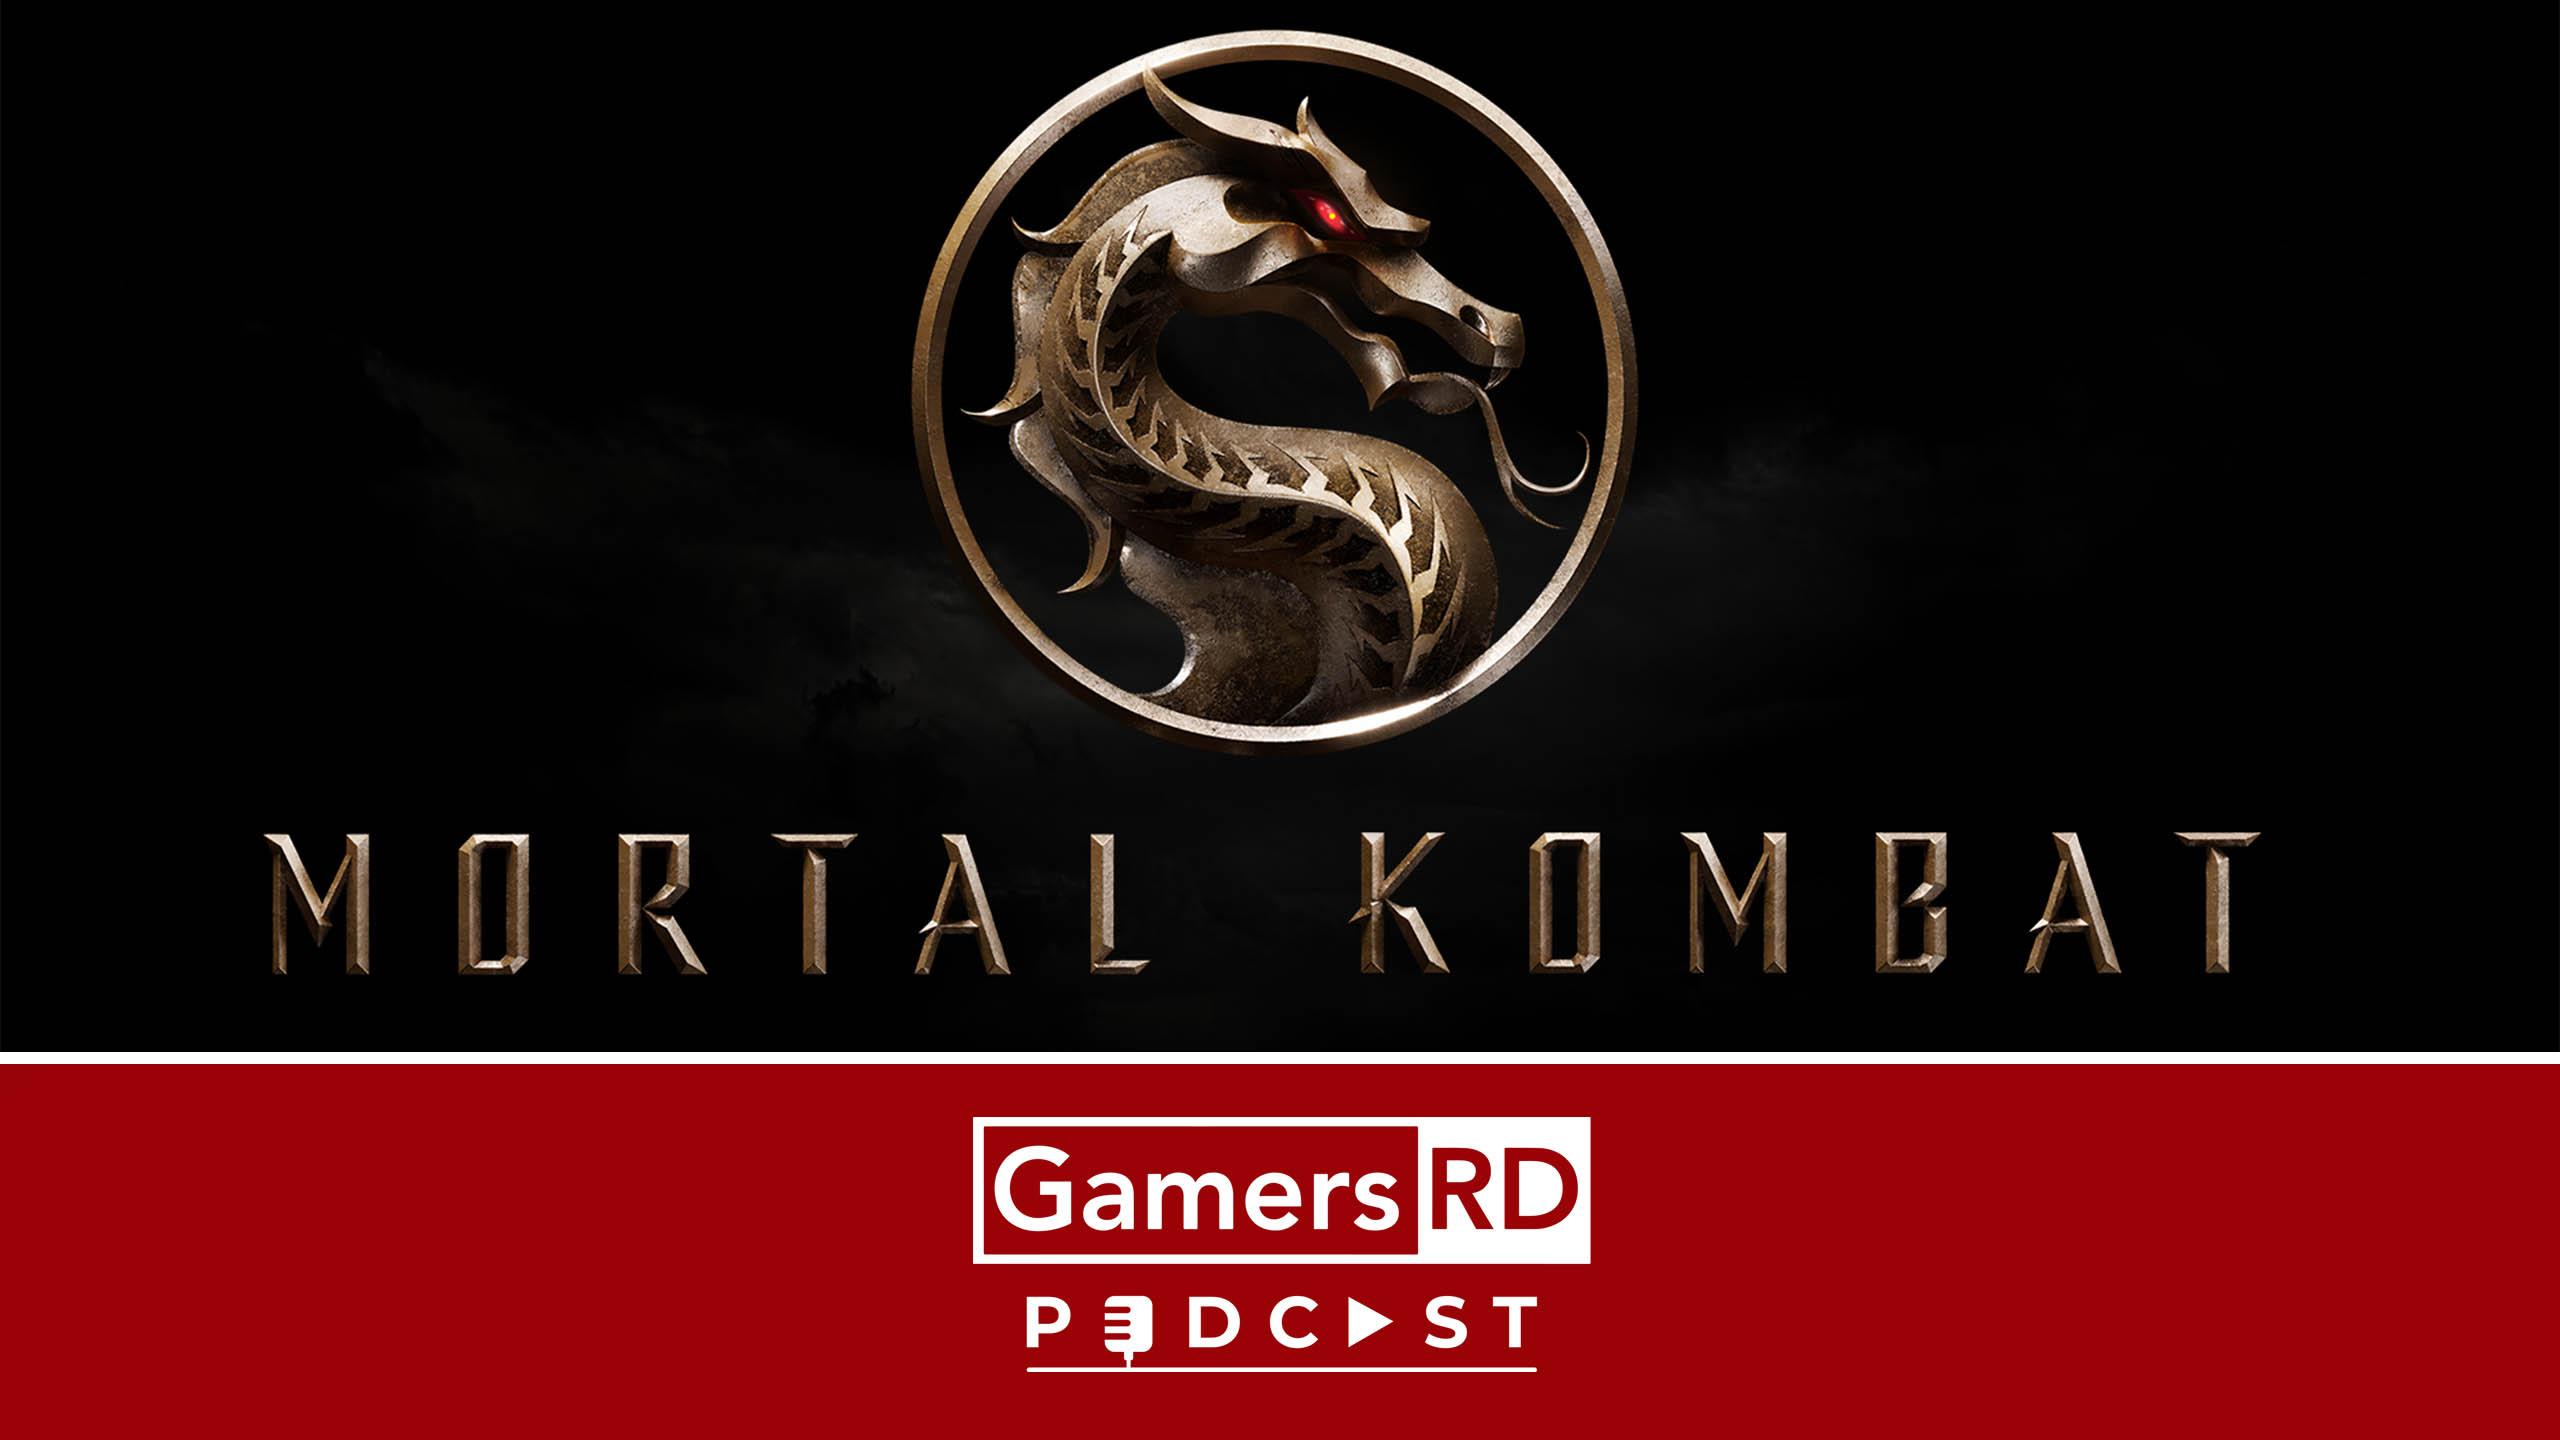 GamersRD Podcast Movie Mortal Kombat